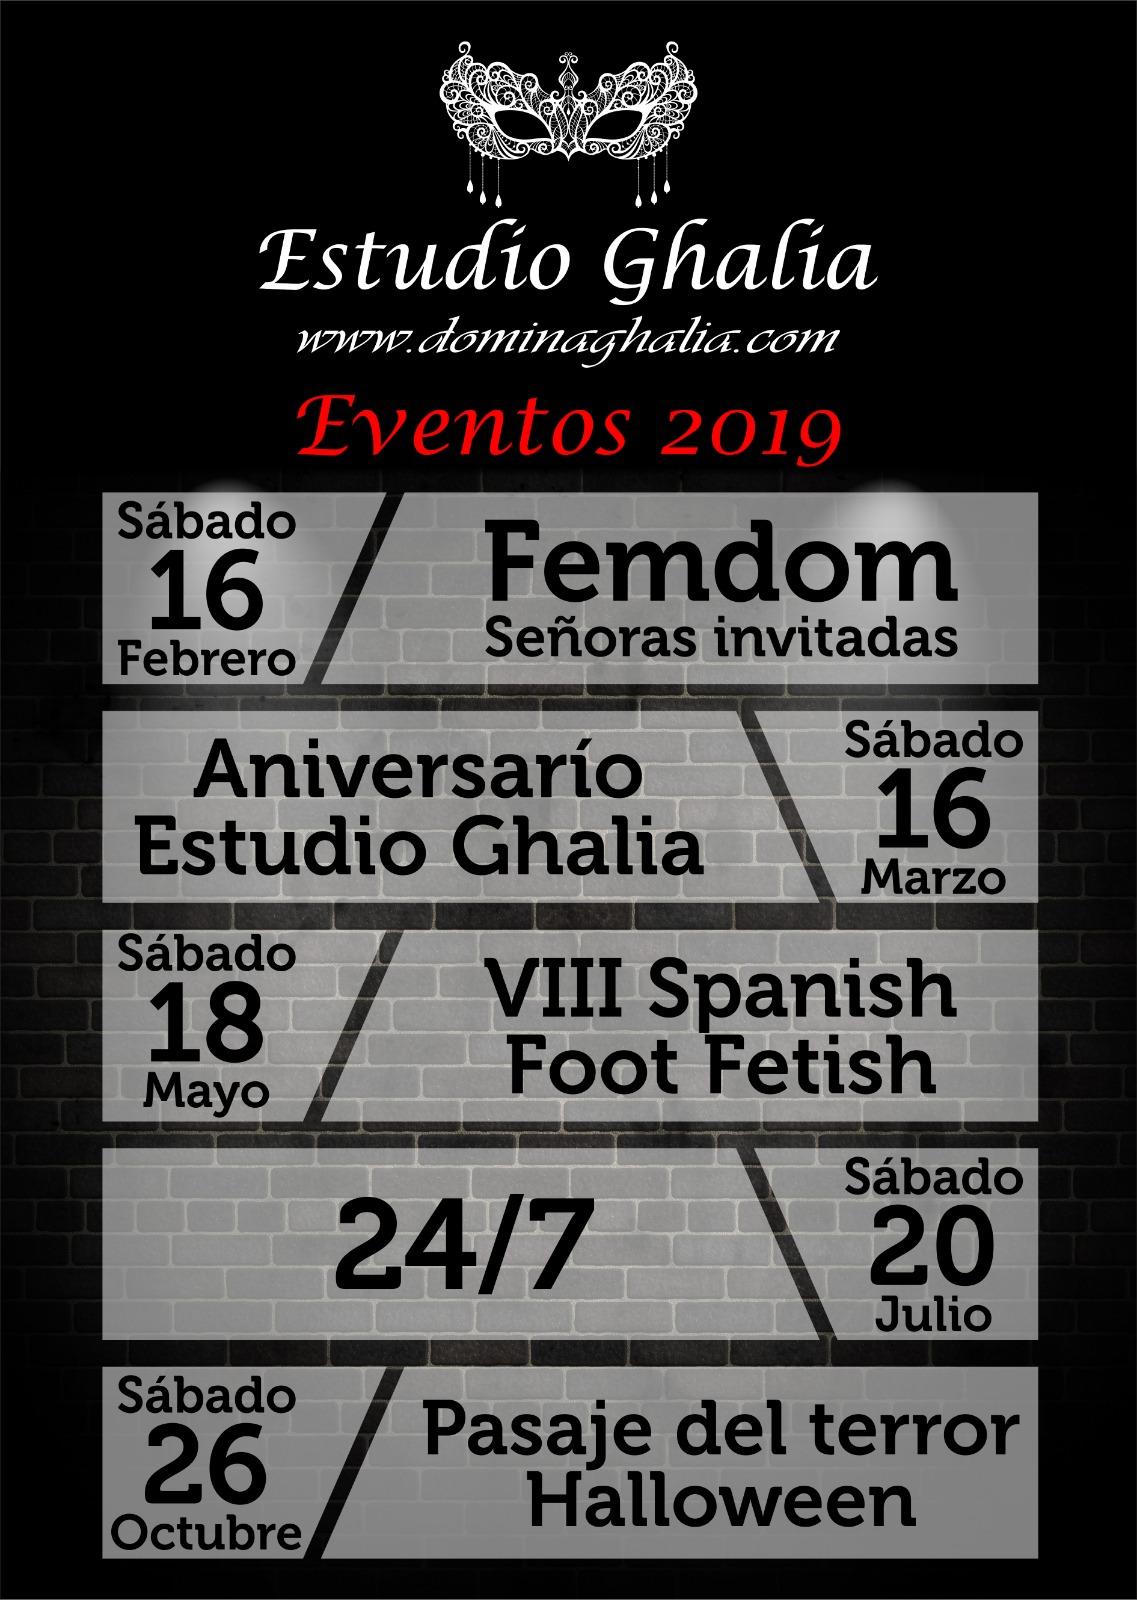 Estudio Ghalia BDSM Benalmádena 2019